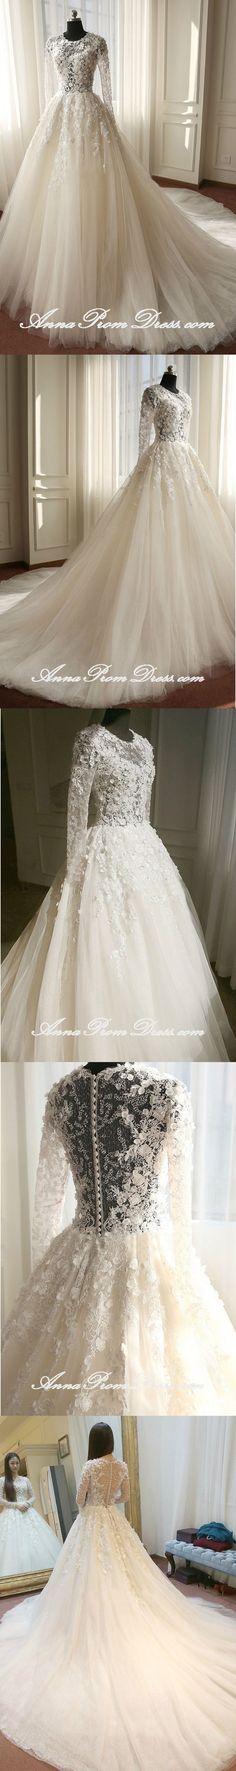 #laceweddingdresses